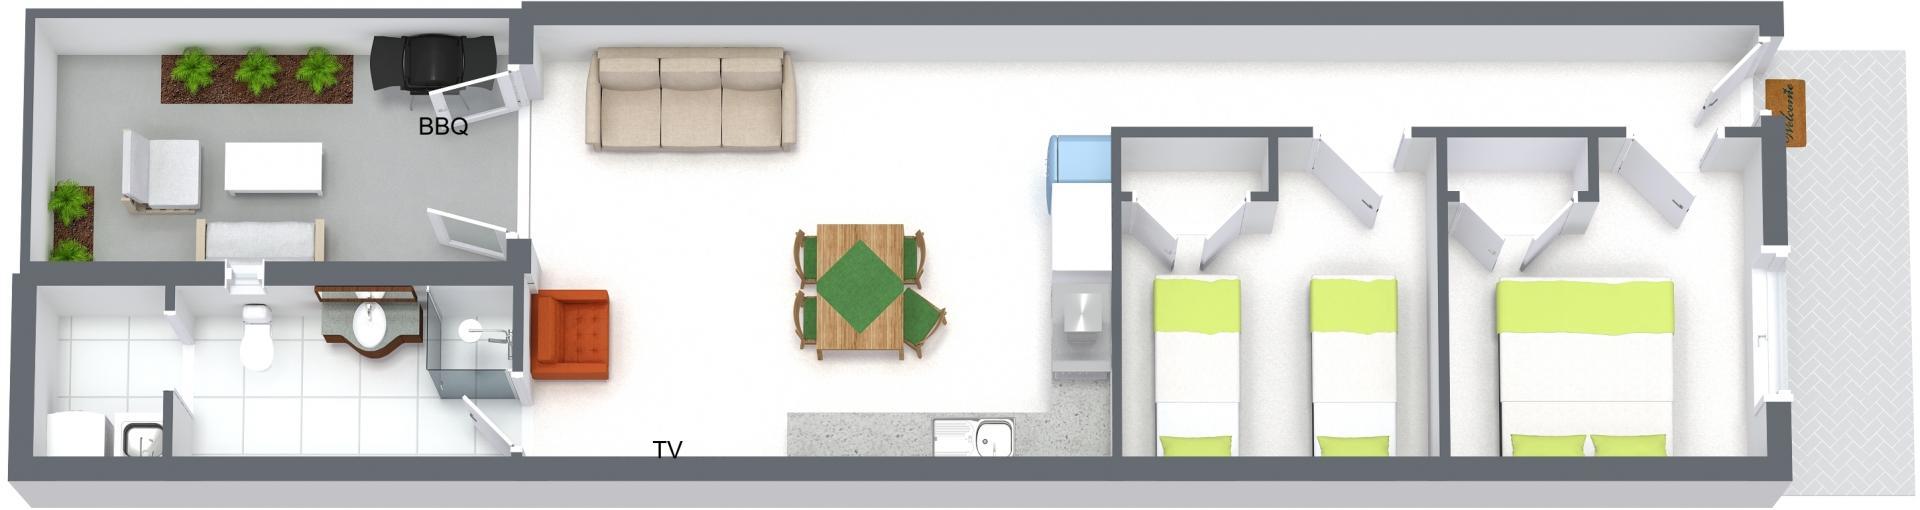 Floorplan at Carlton Terrace